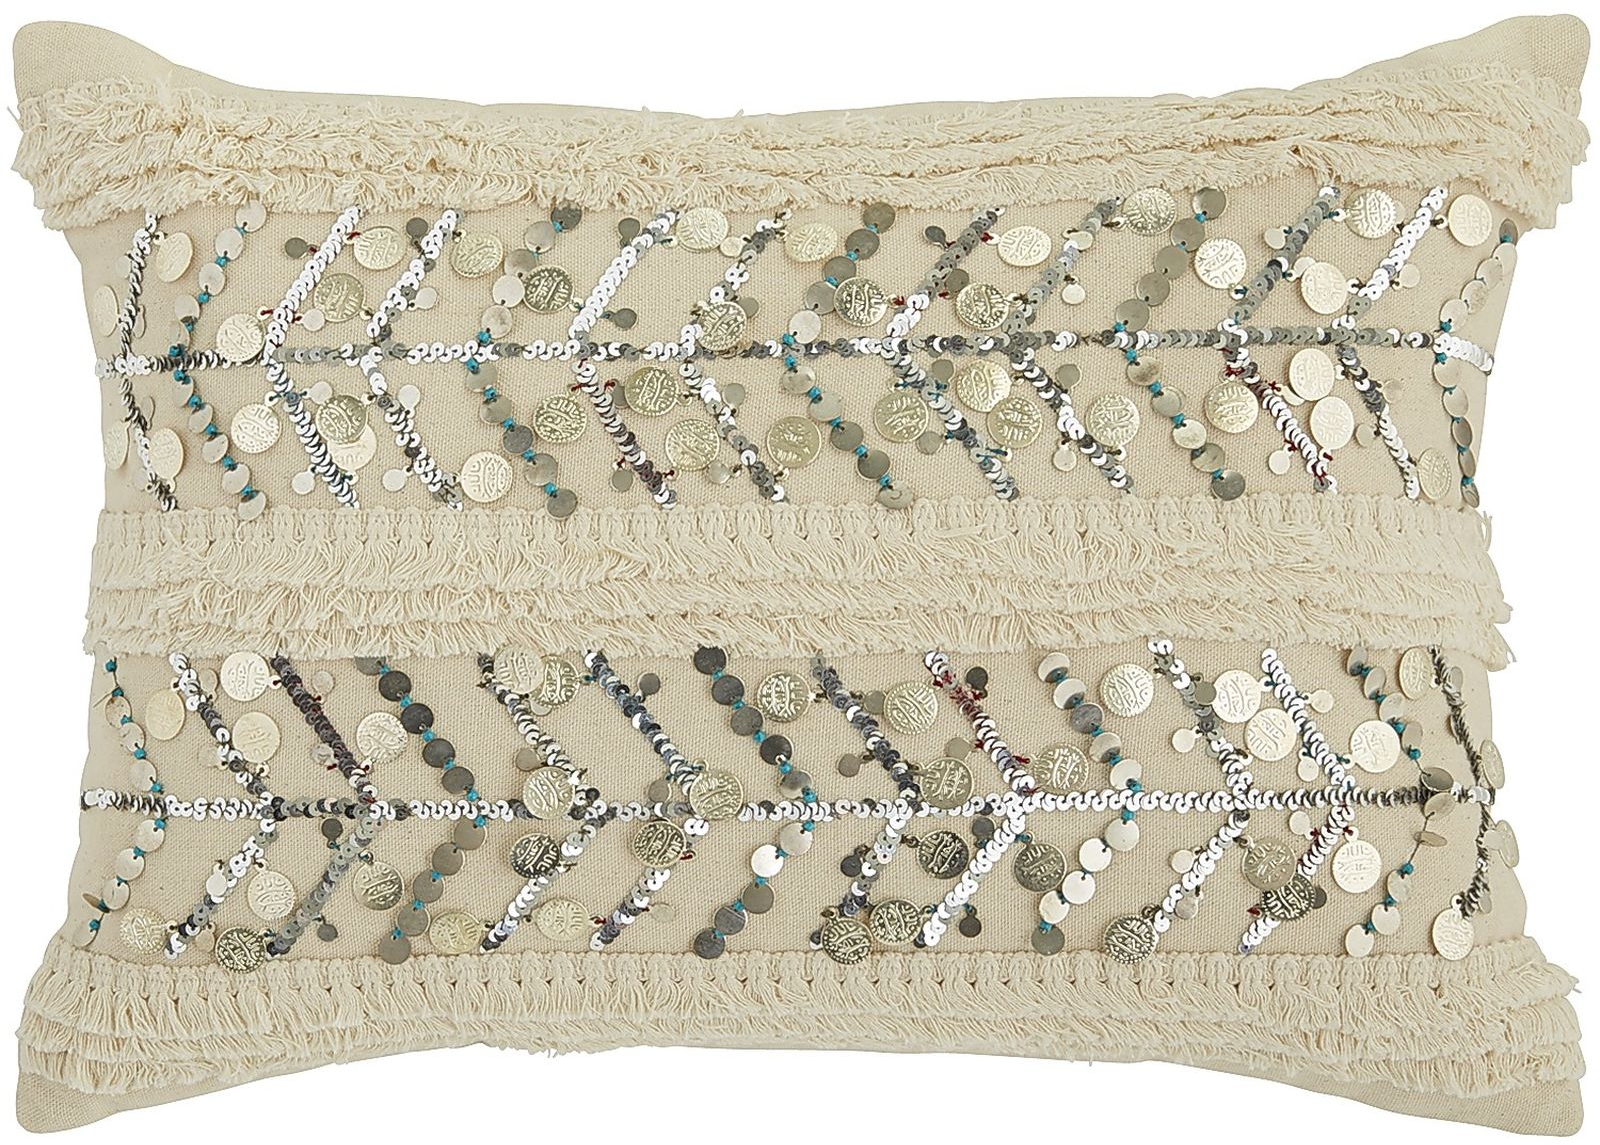 Boho Esmeralda Coin Pillow | Pier 1 Imports